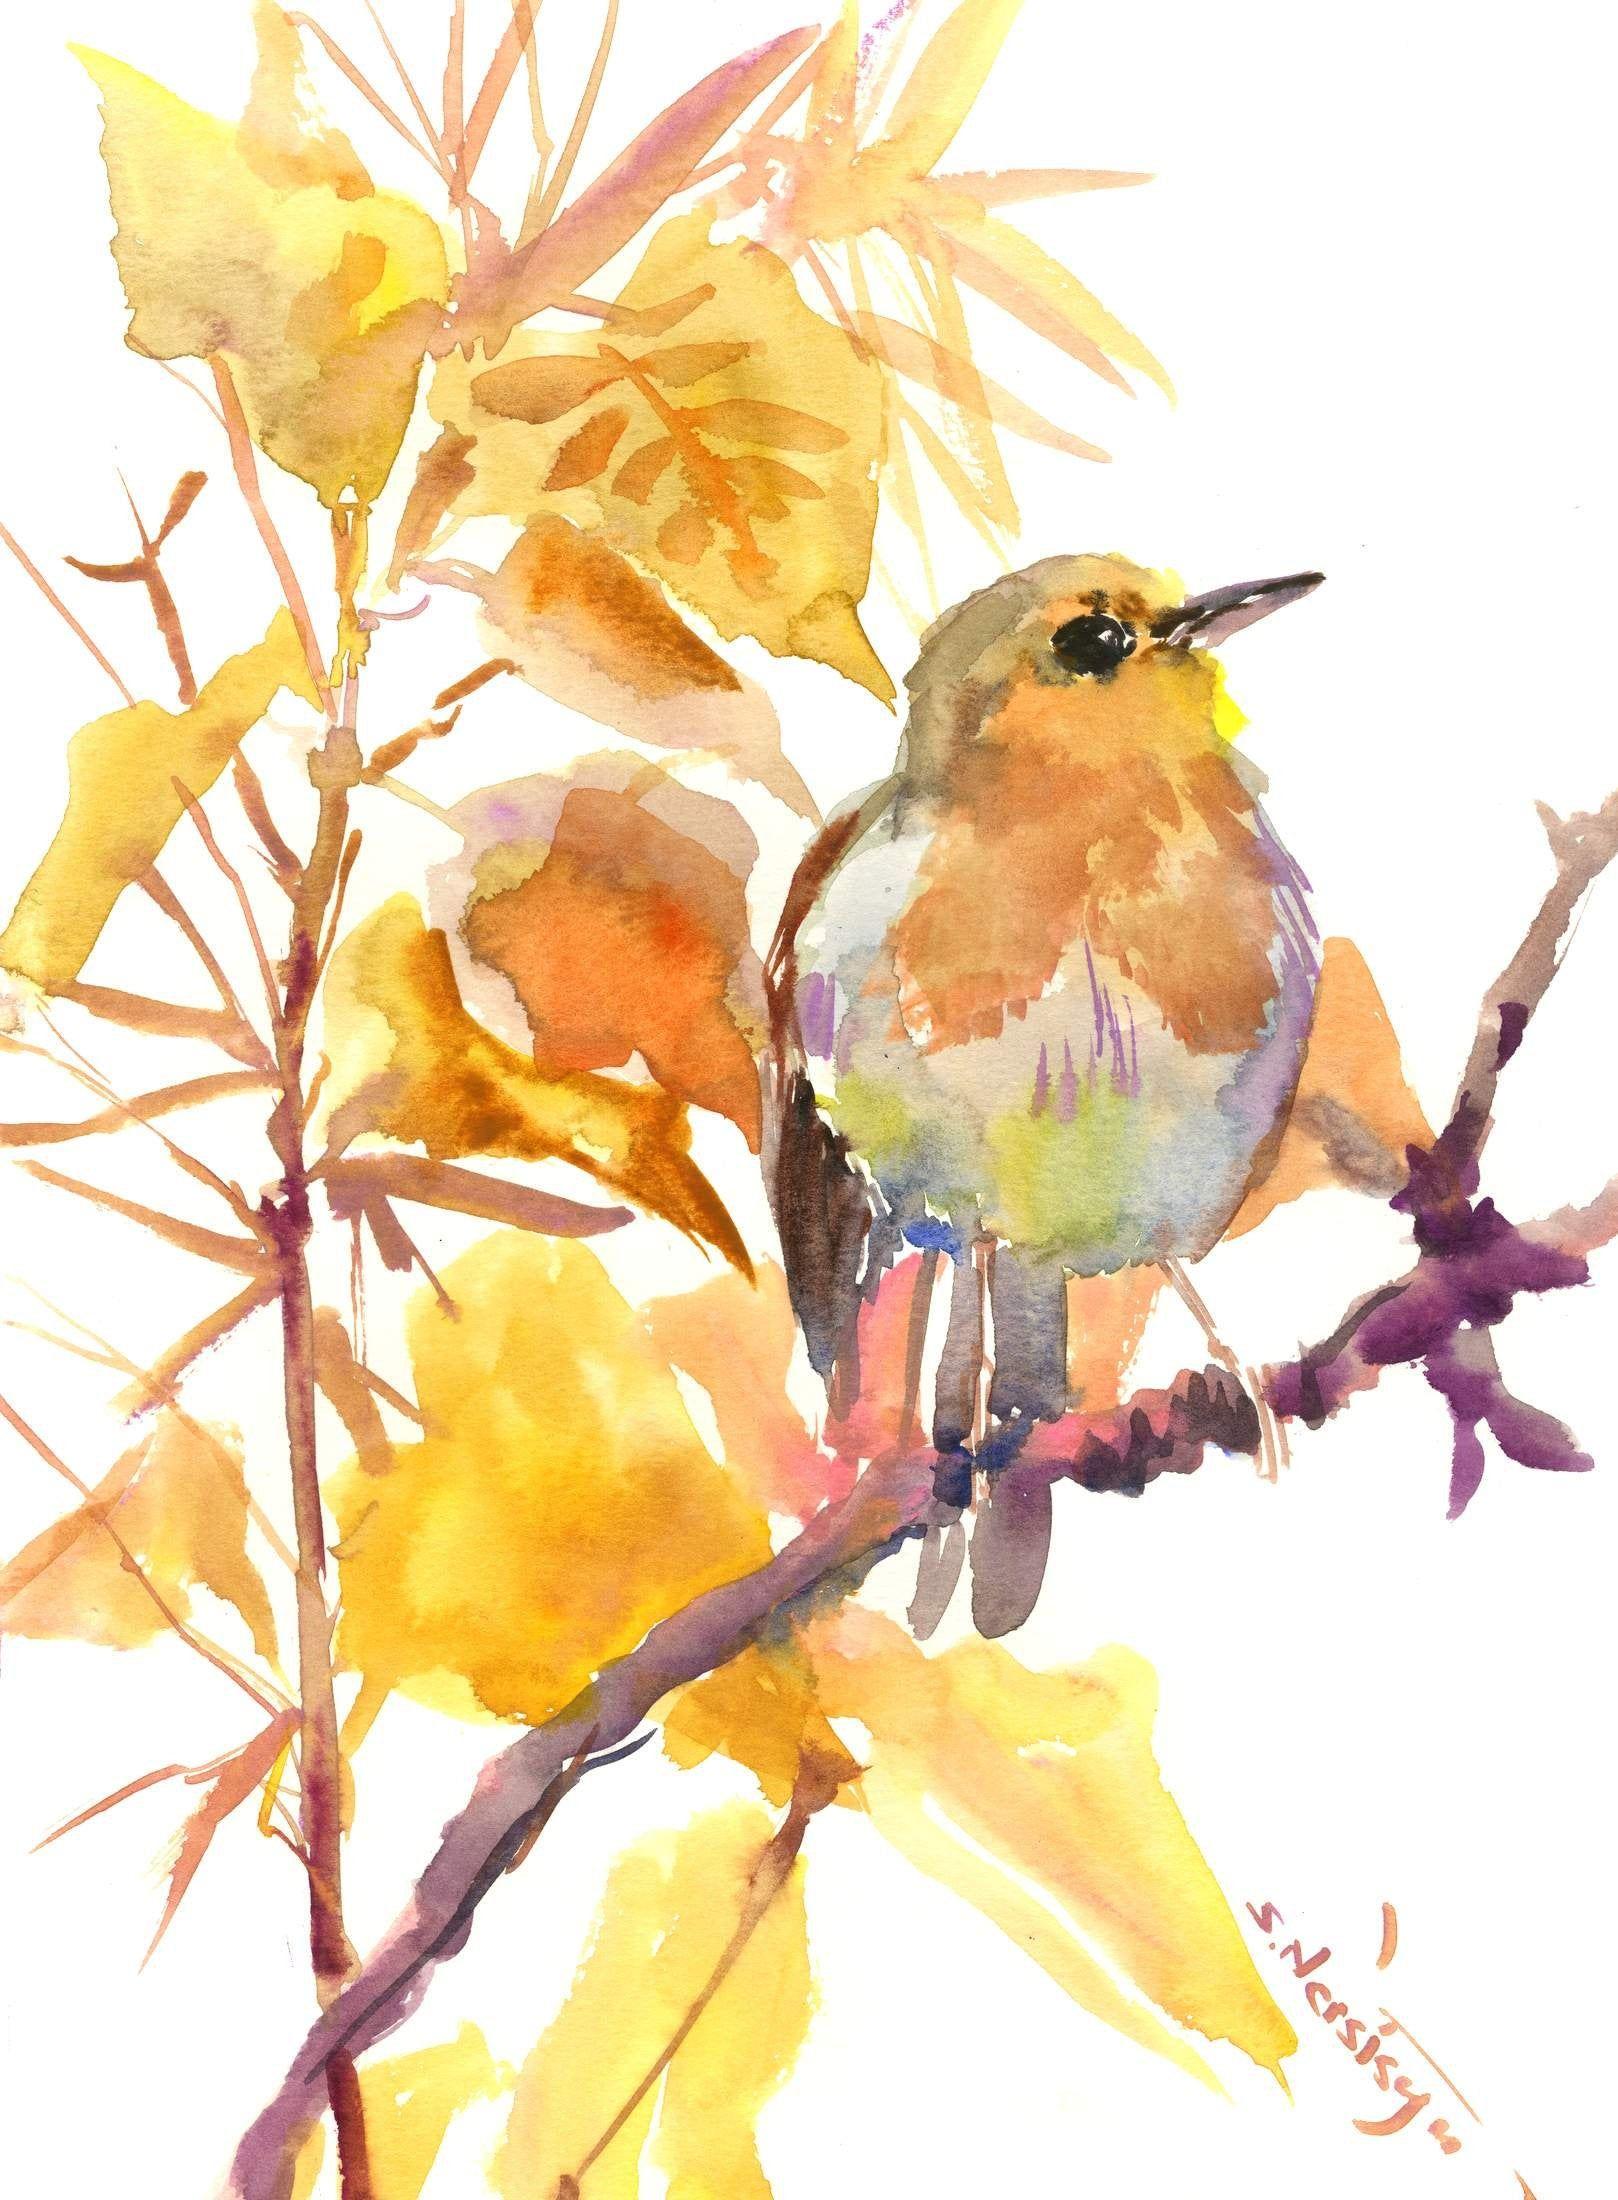 Autumn Colors Original 9x12 Cold Pressed Watercolor Illustration